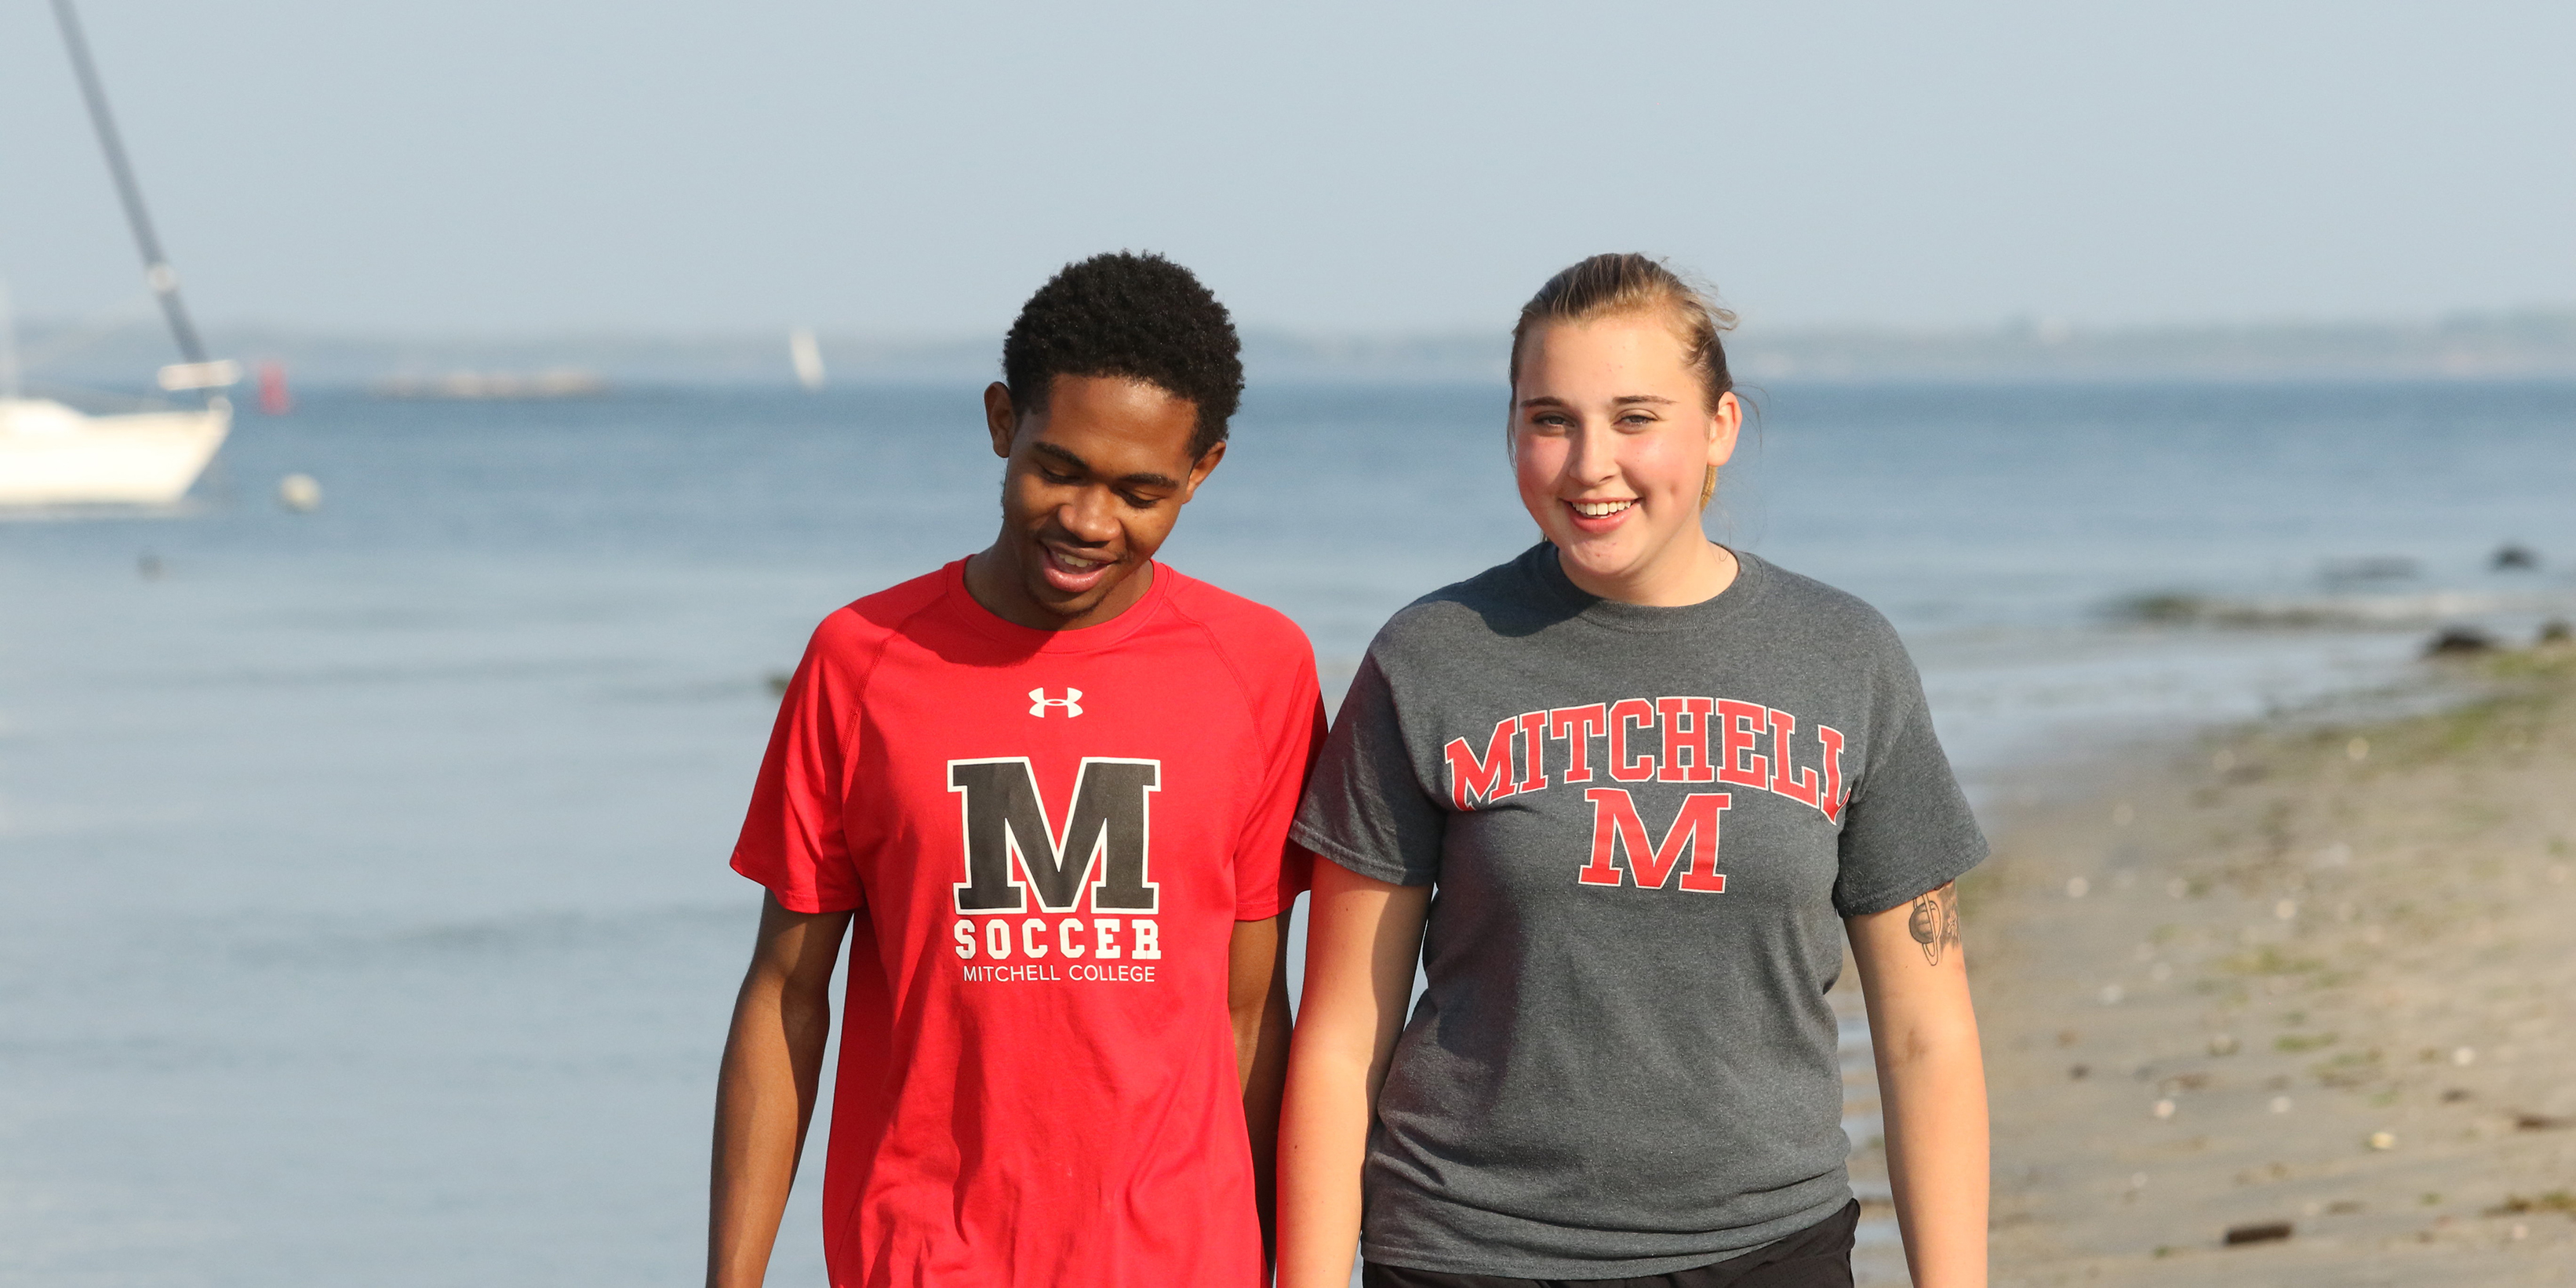 Mystic Program, Mitchell College